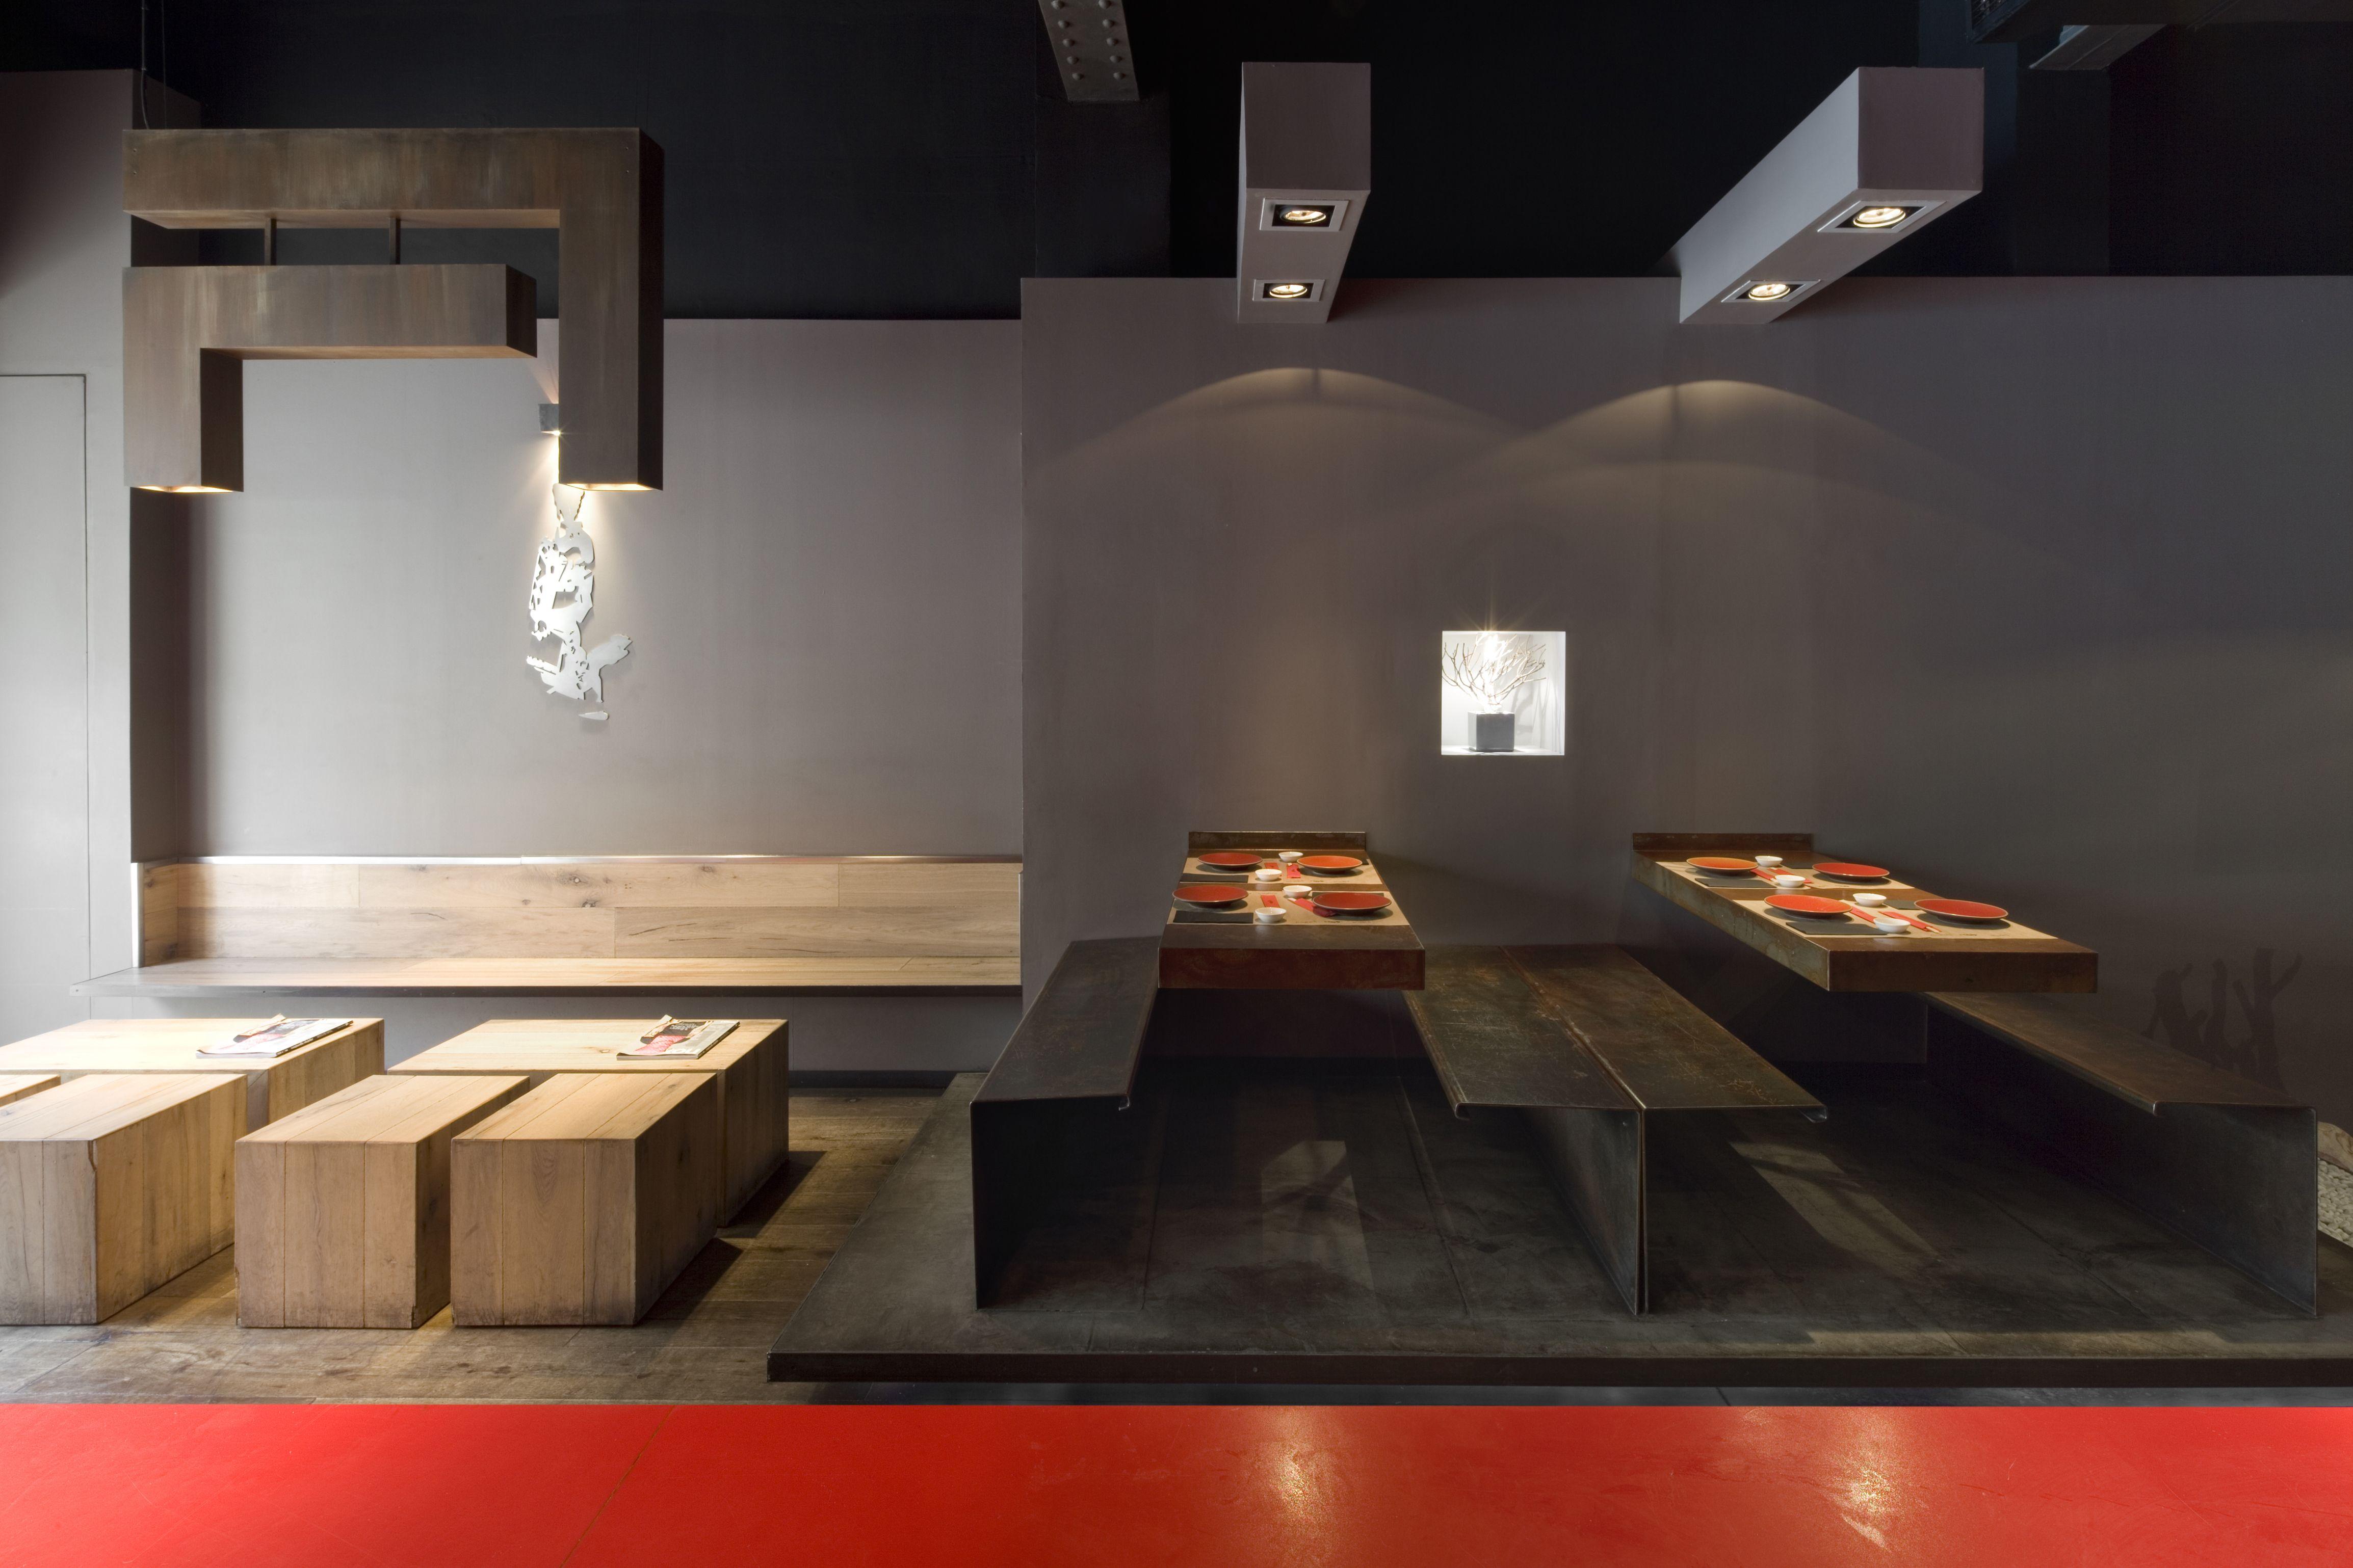 Restaurante Nomo By Estudijosepcortina Design Dise O  # Muebles Dettaglio Condesa